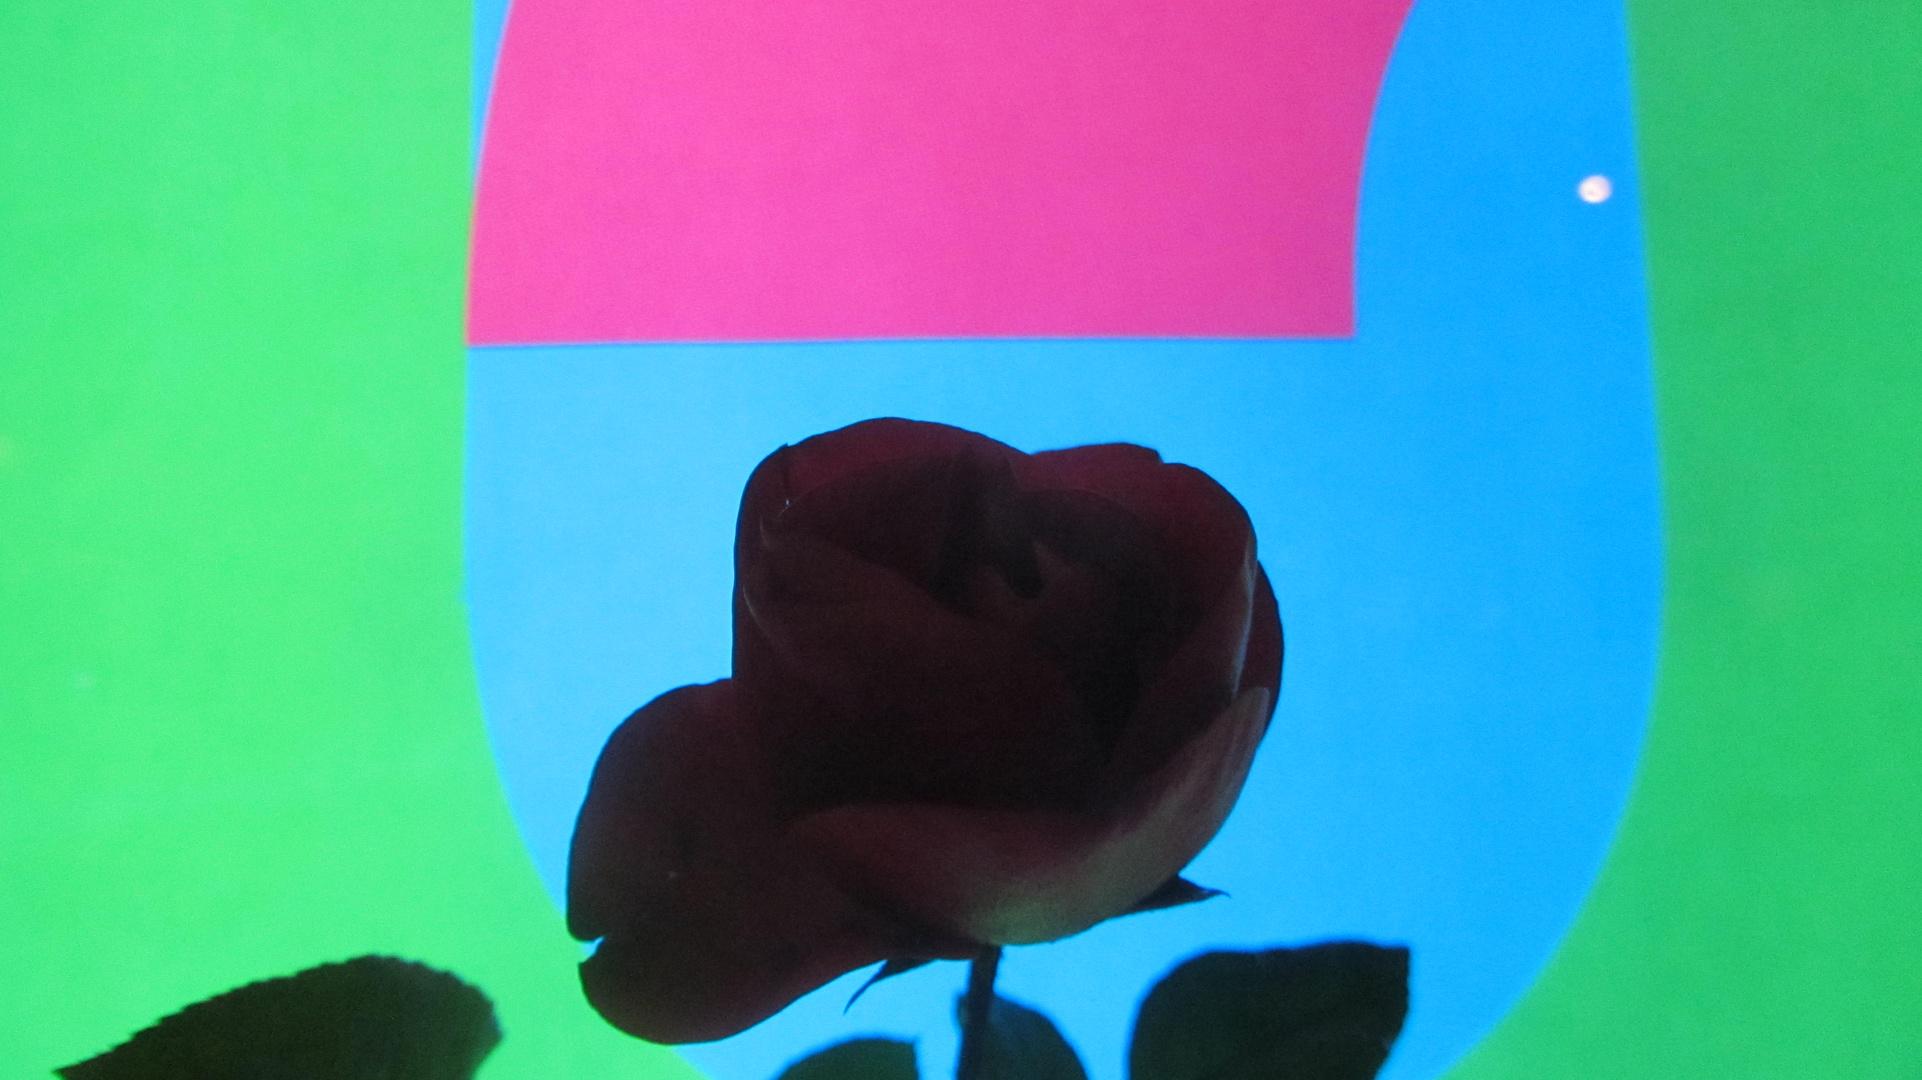 die Rose...die harben..und die formen